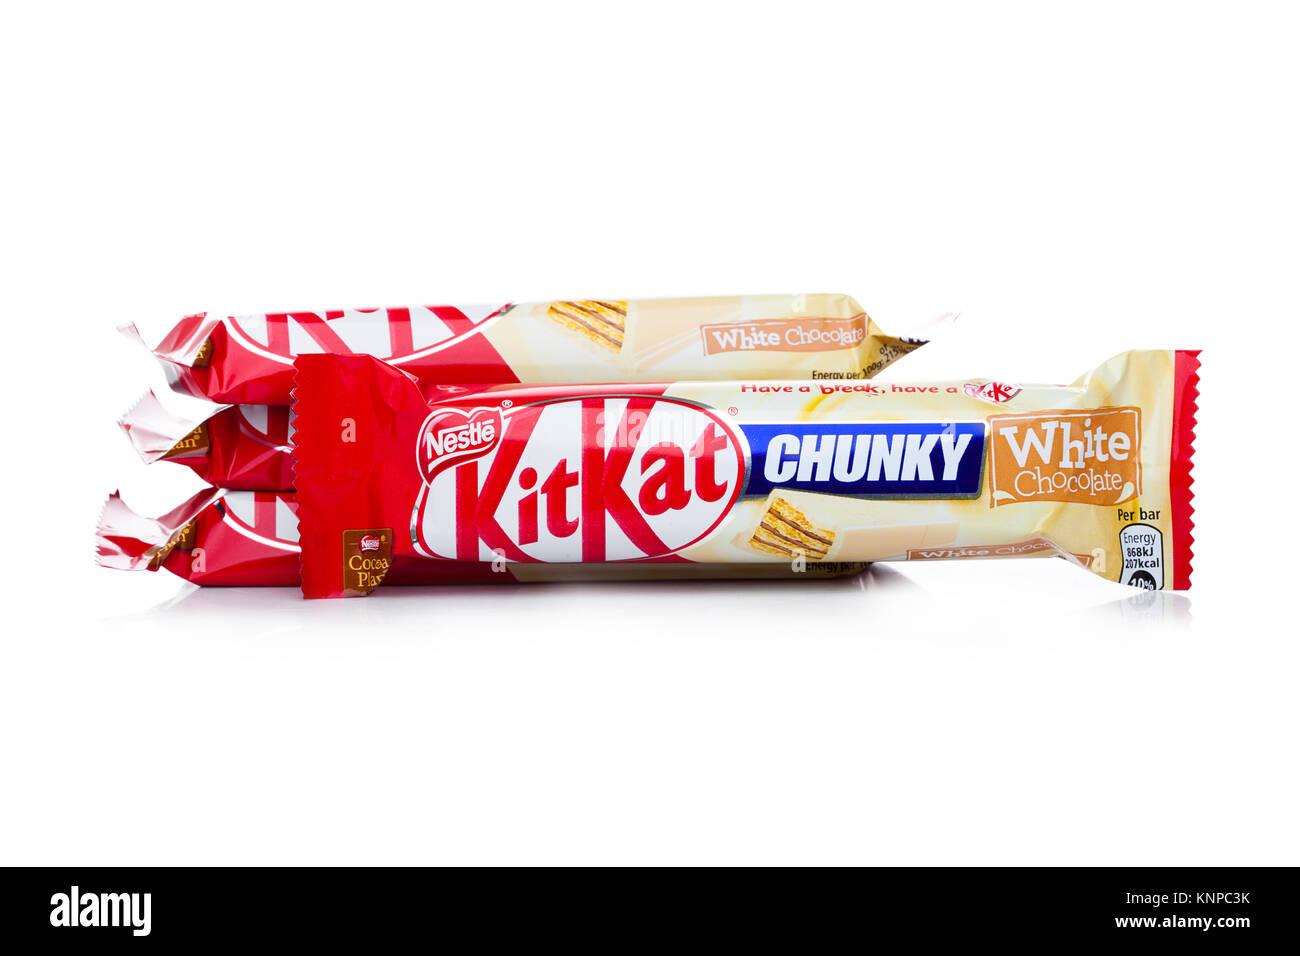 LONDON, UK -DECEMBER 07, 2017: Kit Kat chunky chocolate bar white chocolate on white background. Bars Kit Kat is - Stock Image